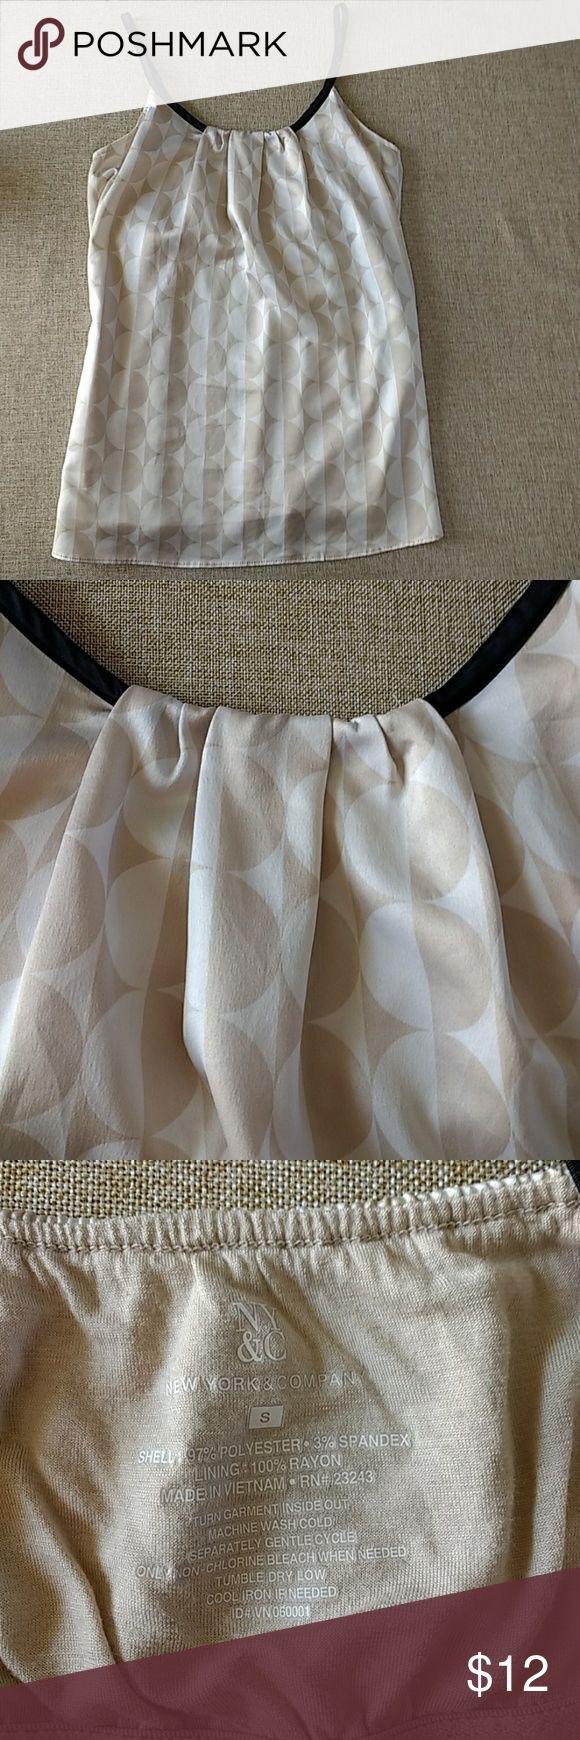 New York & Company camisole size medium Adorable camisole with shelf bra size small New York & Company Tops Camisoles